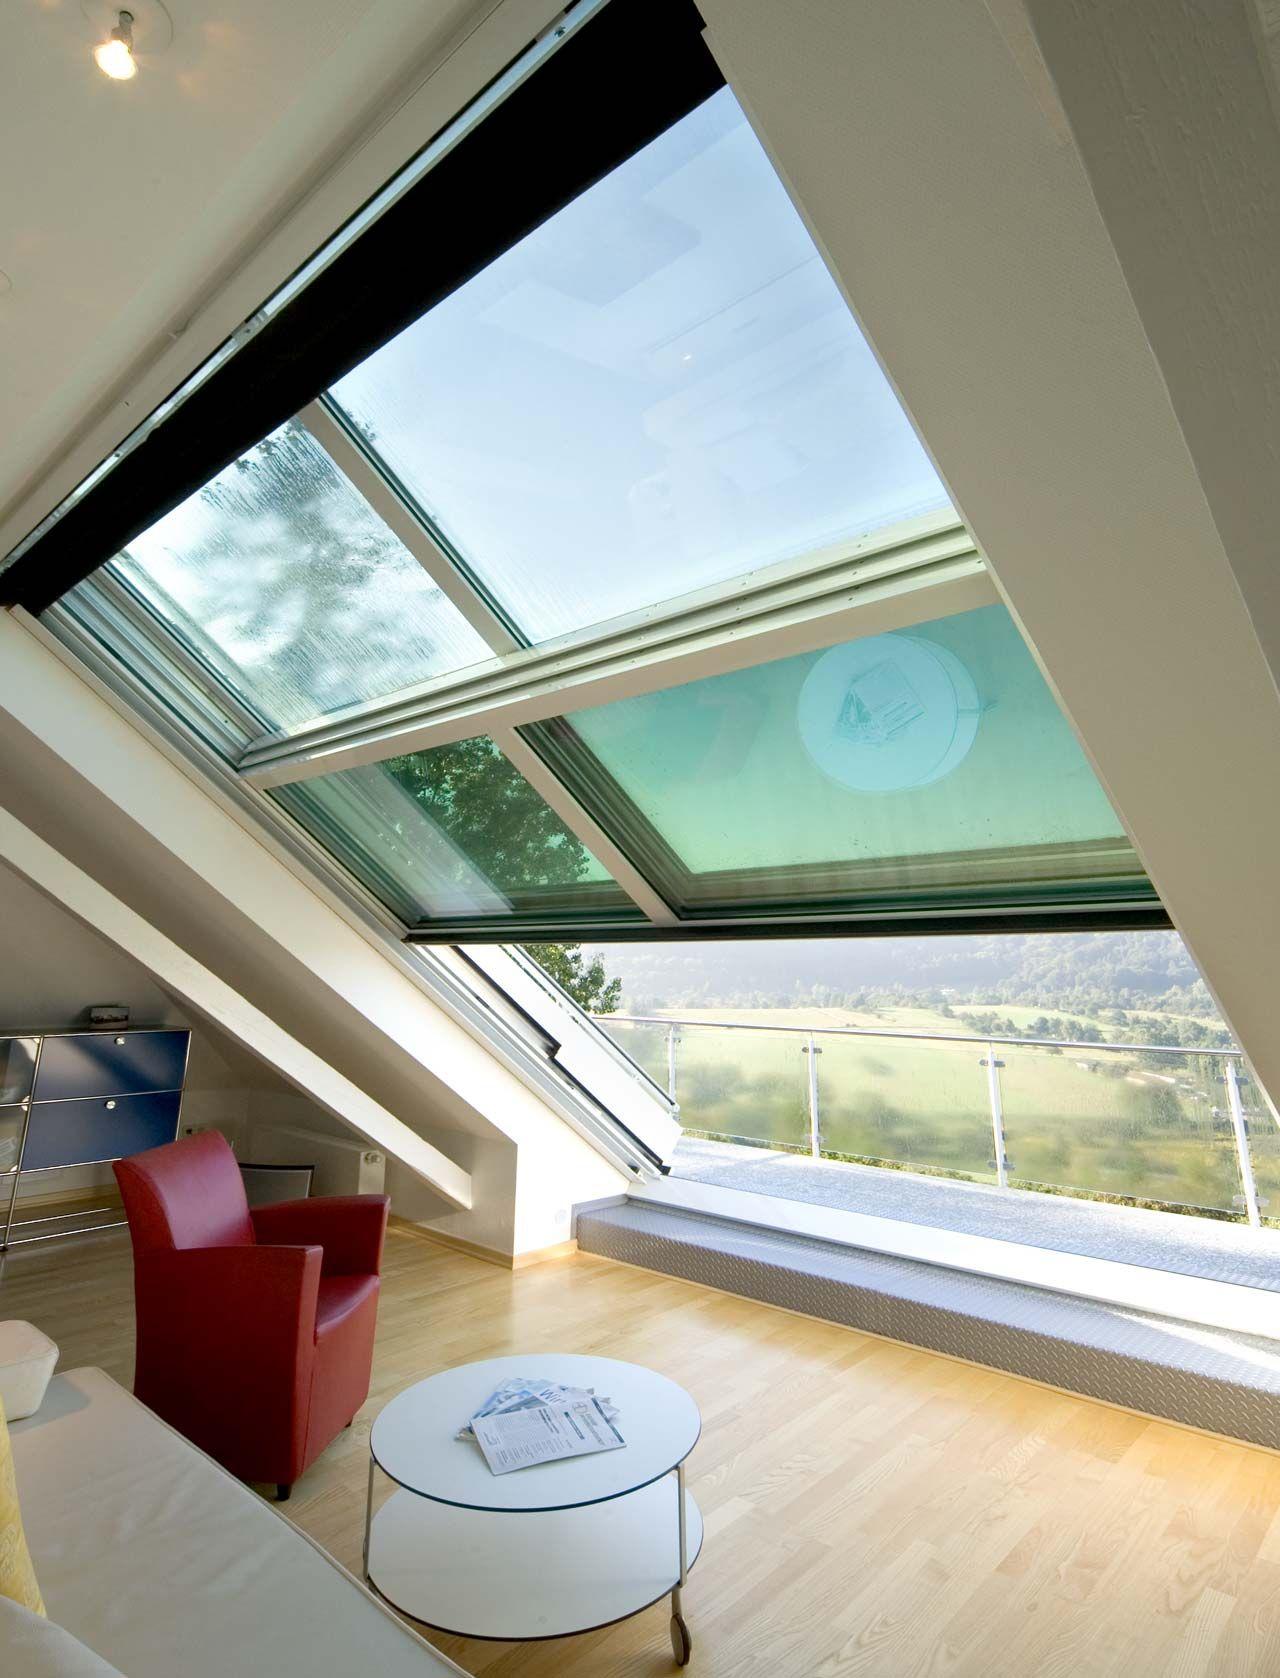 Loft bedroom windows  OpenAir dakschuiframen  Aschbach  Pinterest  Master bedroom Tubs